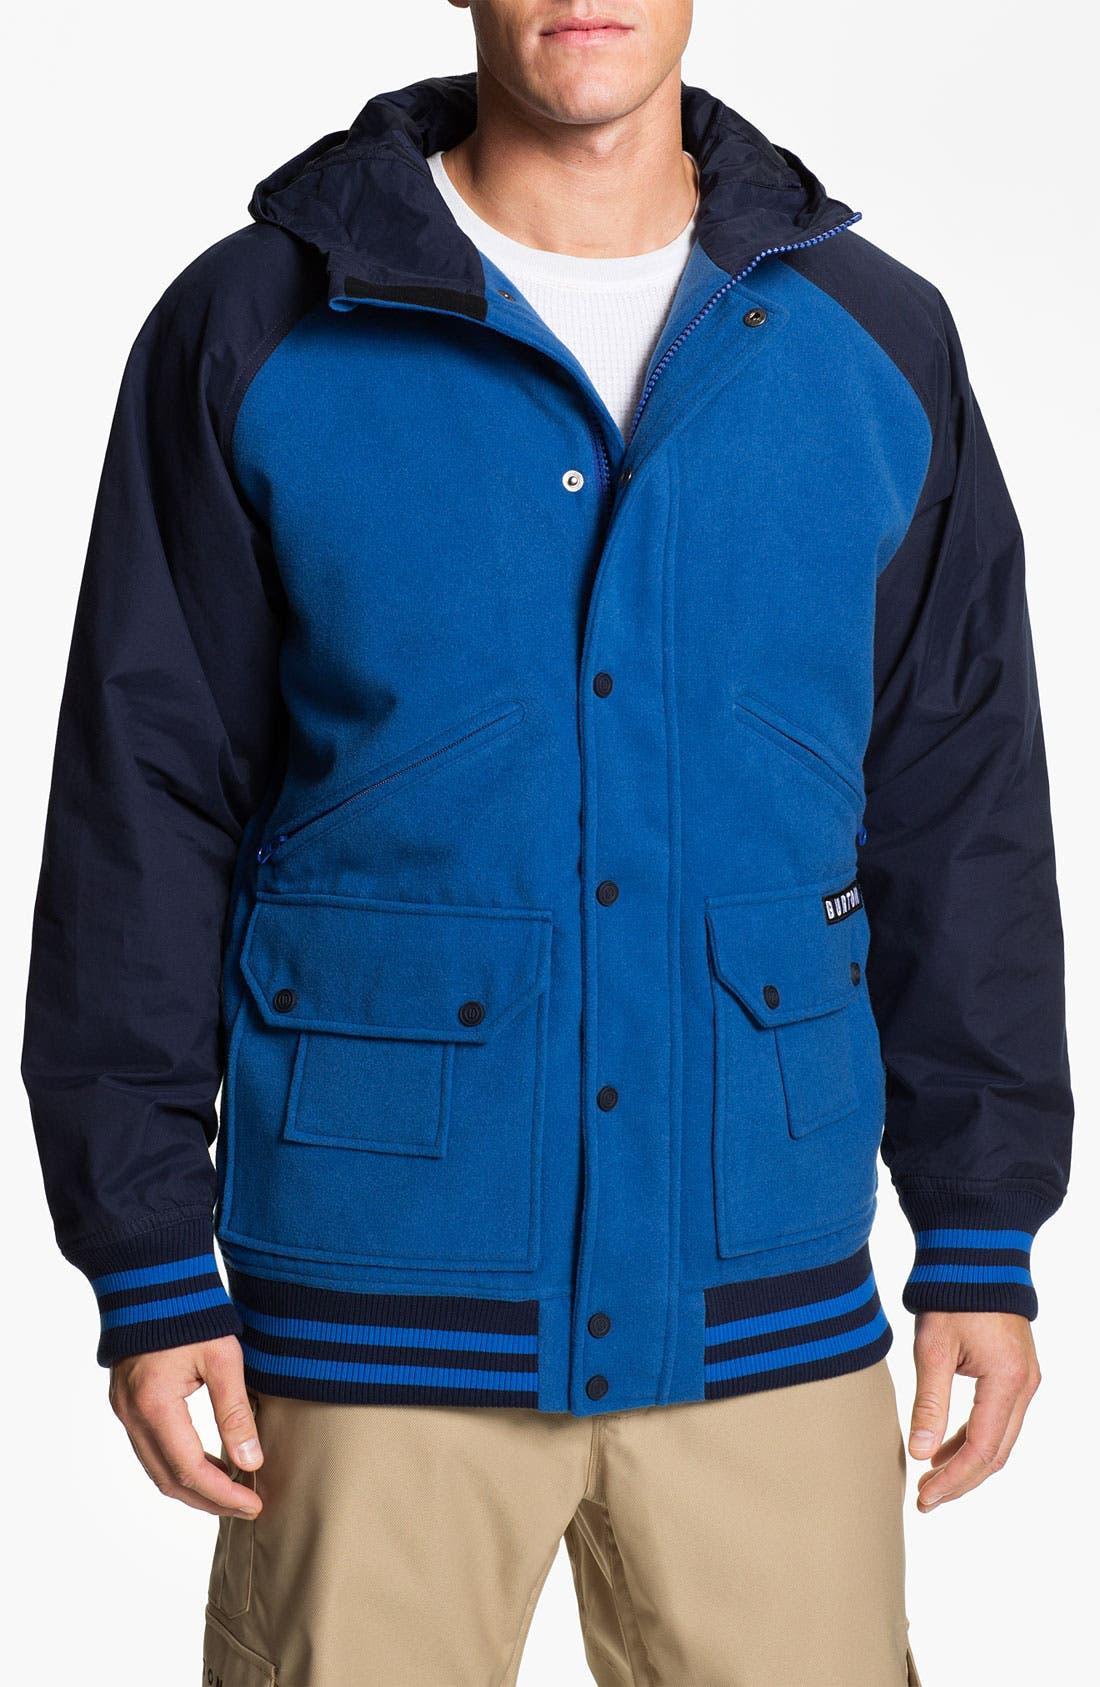 Main Image - Burton 'B-Side' Varsity Jacket